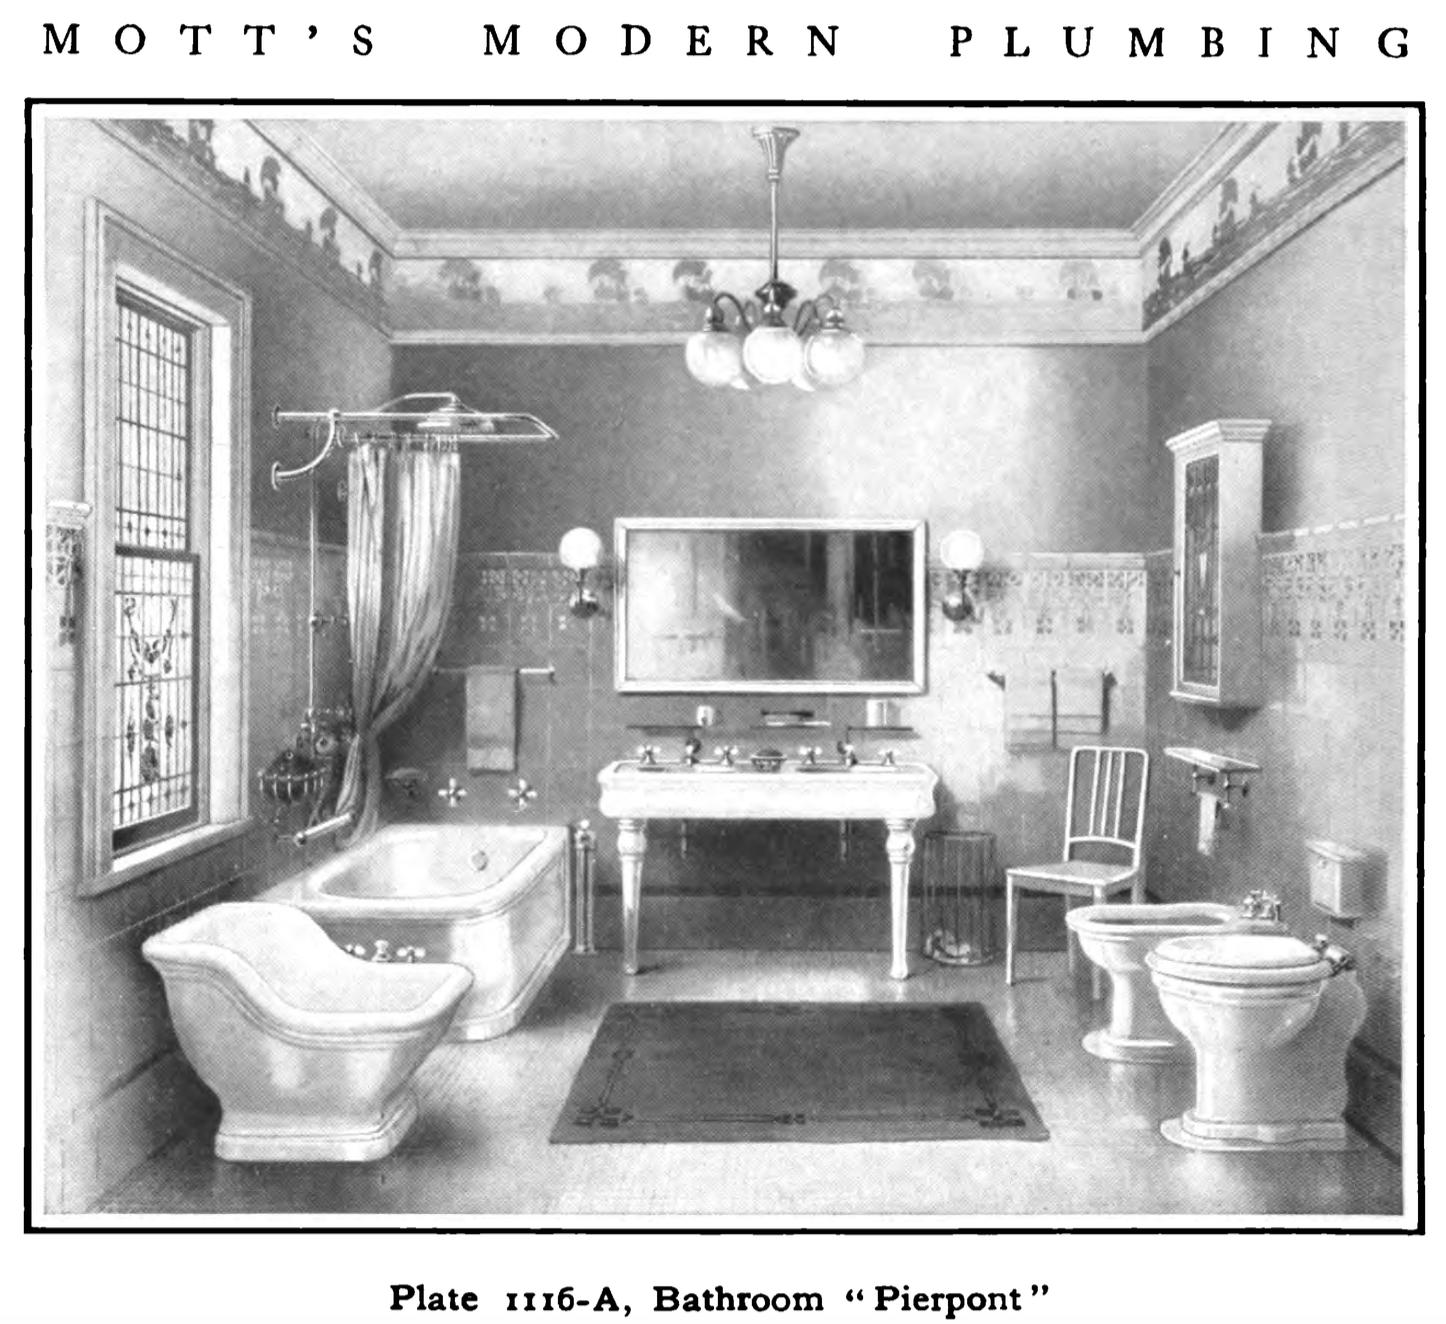 Laurelhurst Craftsman Bungalow: Mott\'s 1914 Plumbing Catalog | Early ...